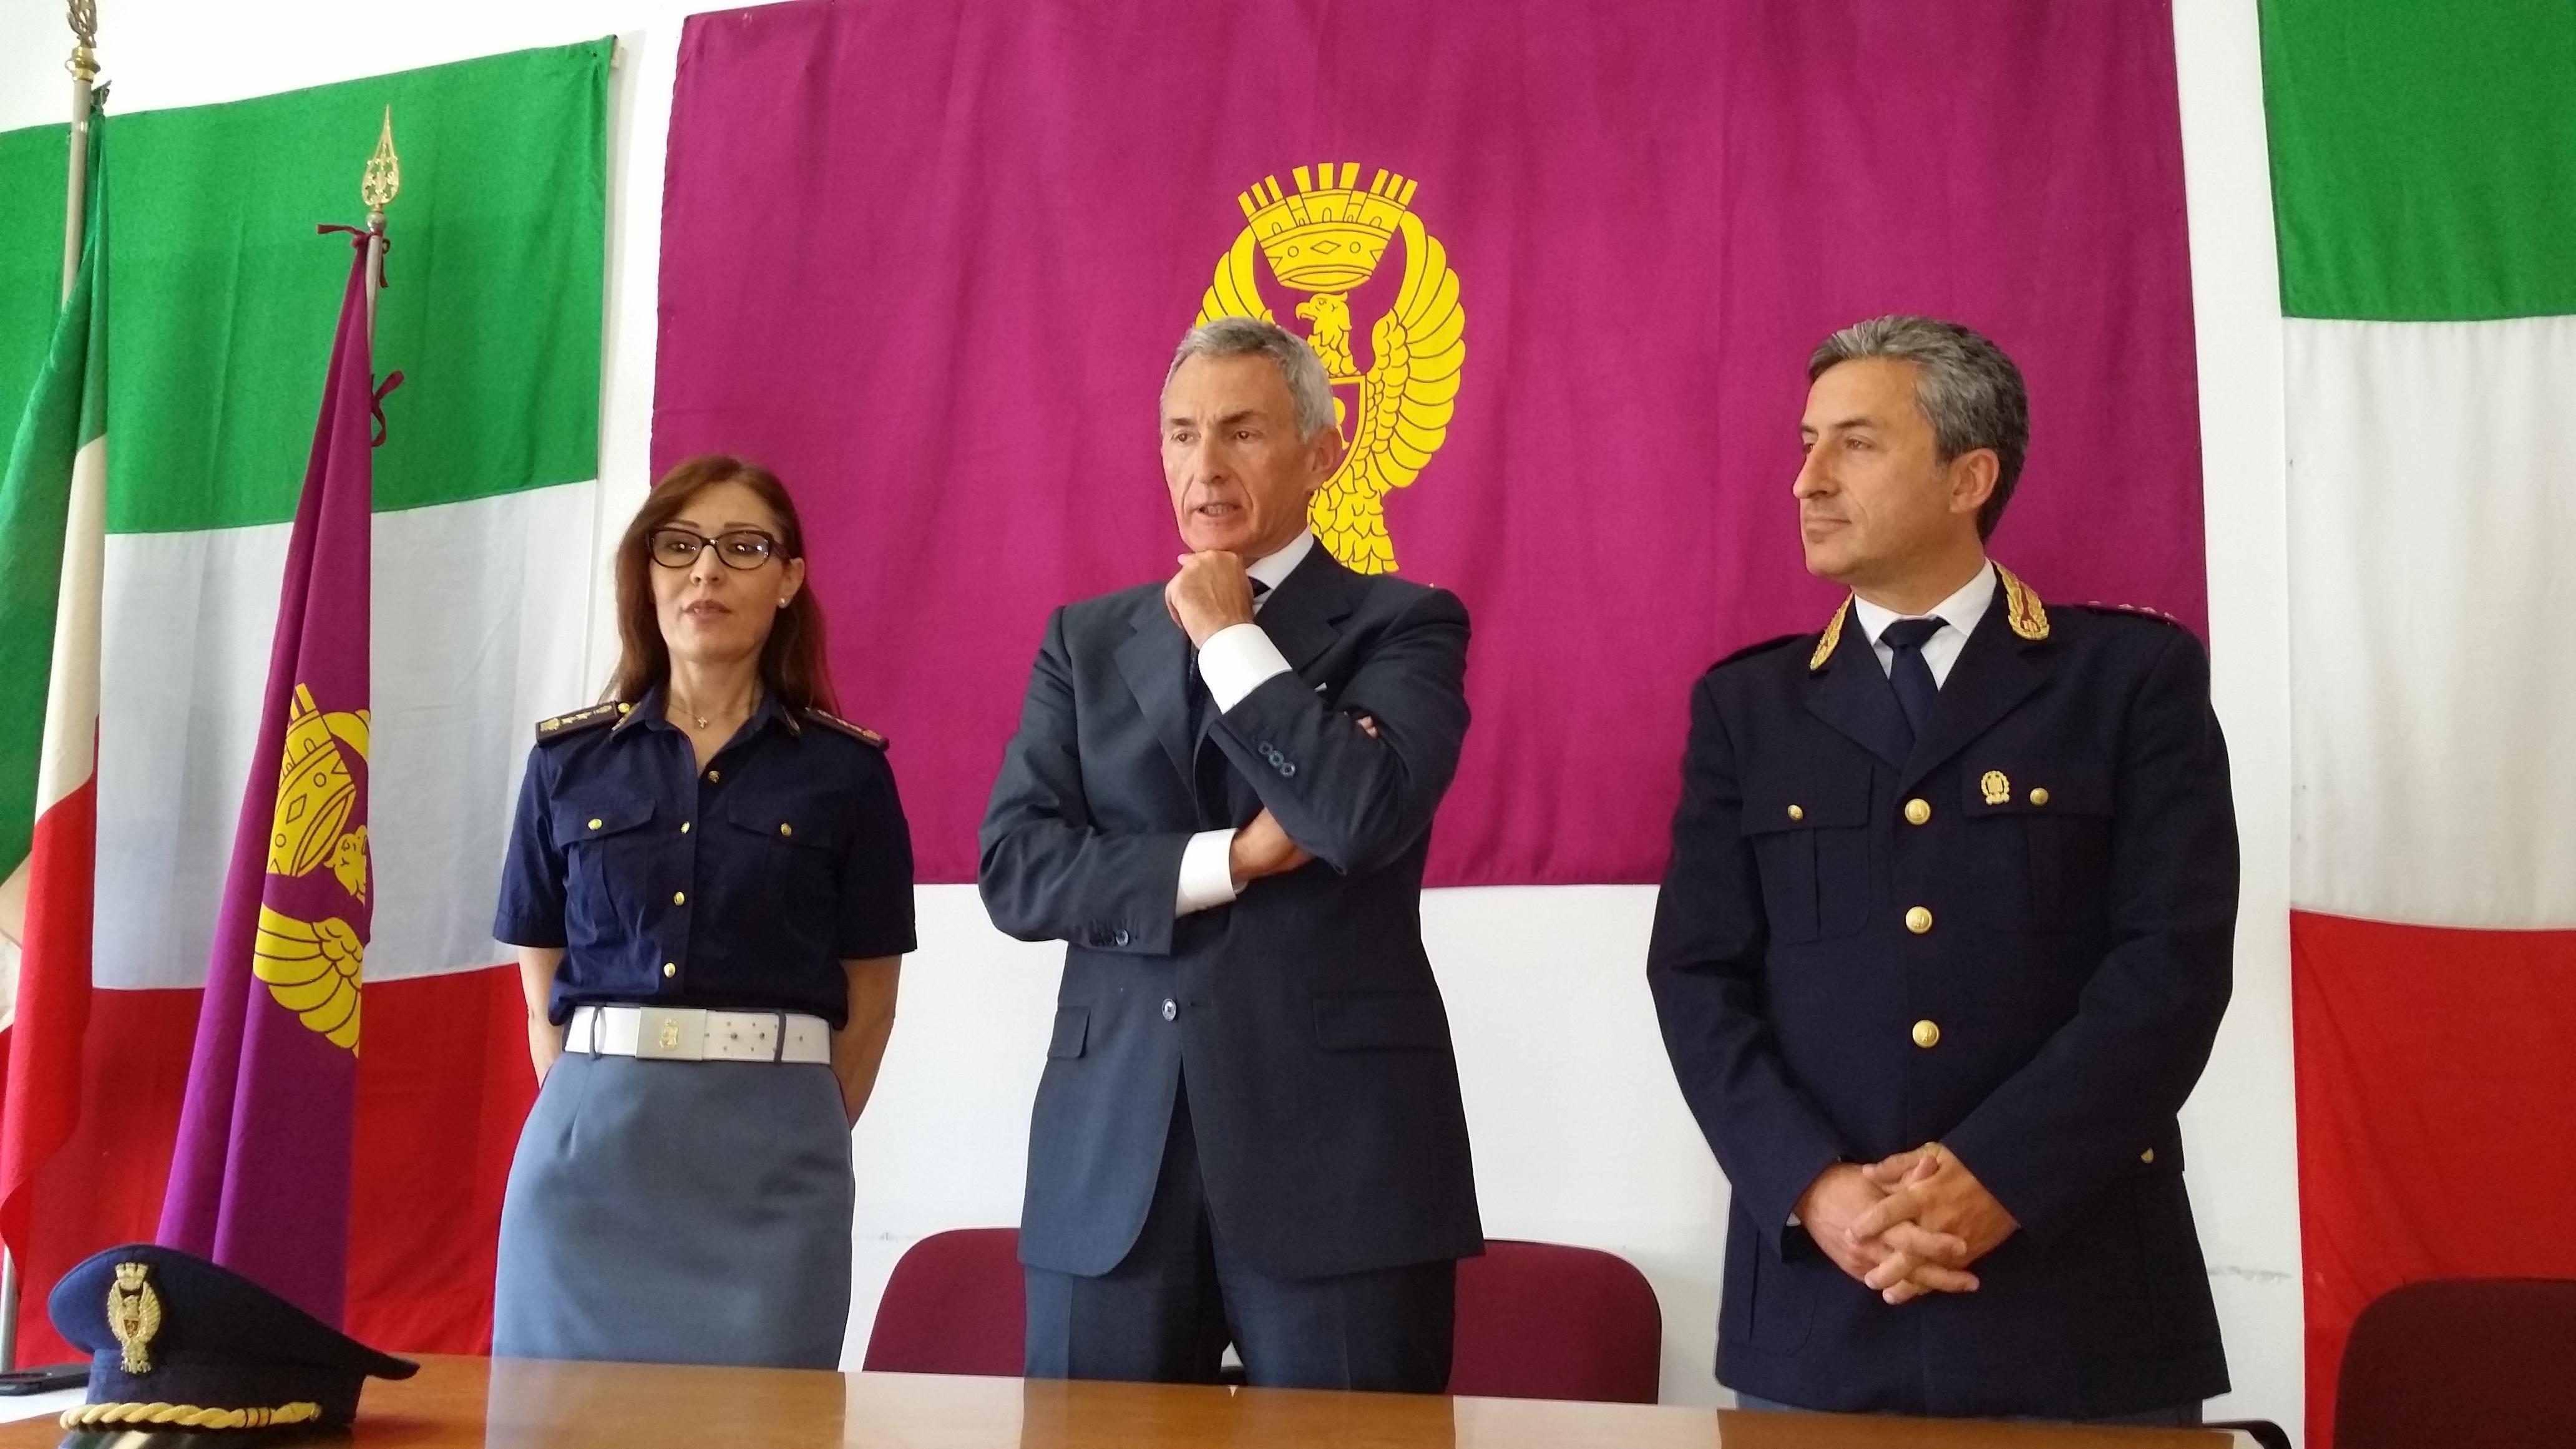 La conferenza stampa di oggi. Da sinistra Manuela Iaione, Giuseppe De Matteis e Carmine Mosca